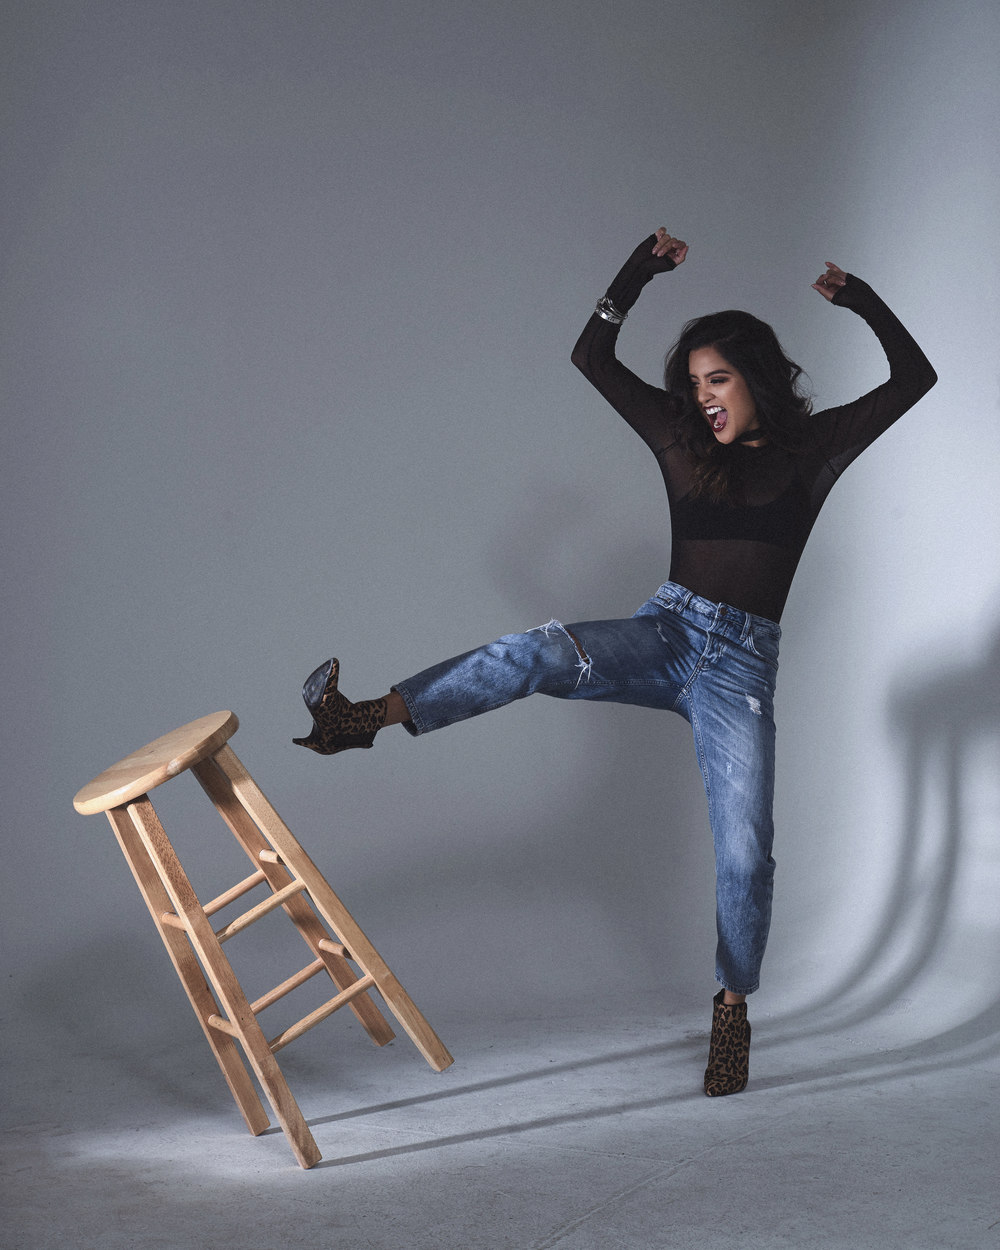 mg bodysuit | choker | fp bralette | topshop jeans (s.)| zara shoes (s.) | HMU janah degillo|photos by sean martin